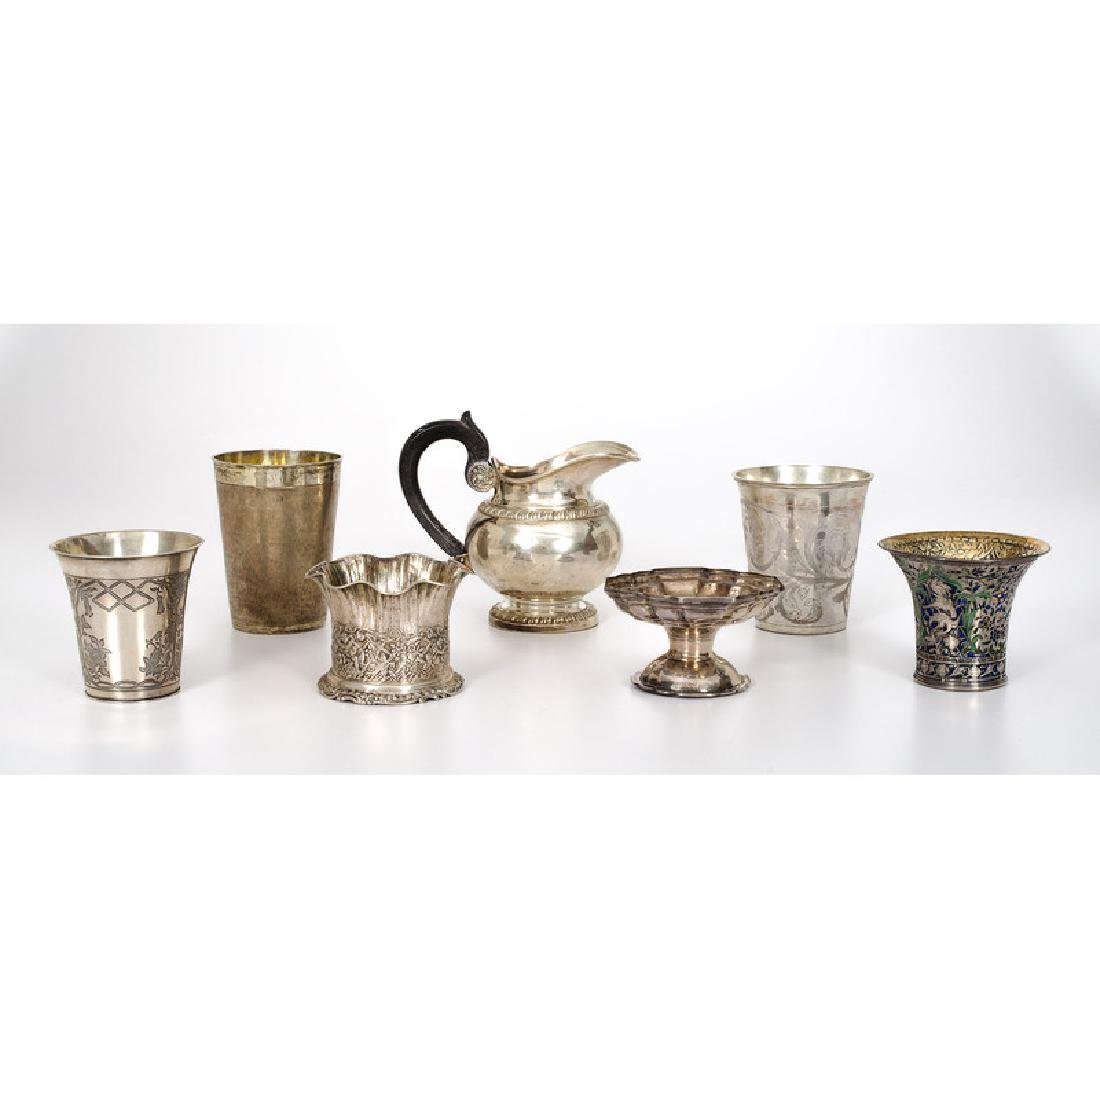 European Silver Beakers, Creamer and Open Salt - 2